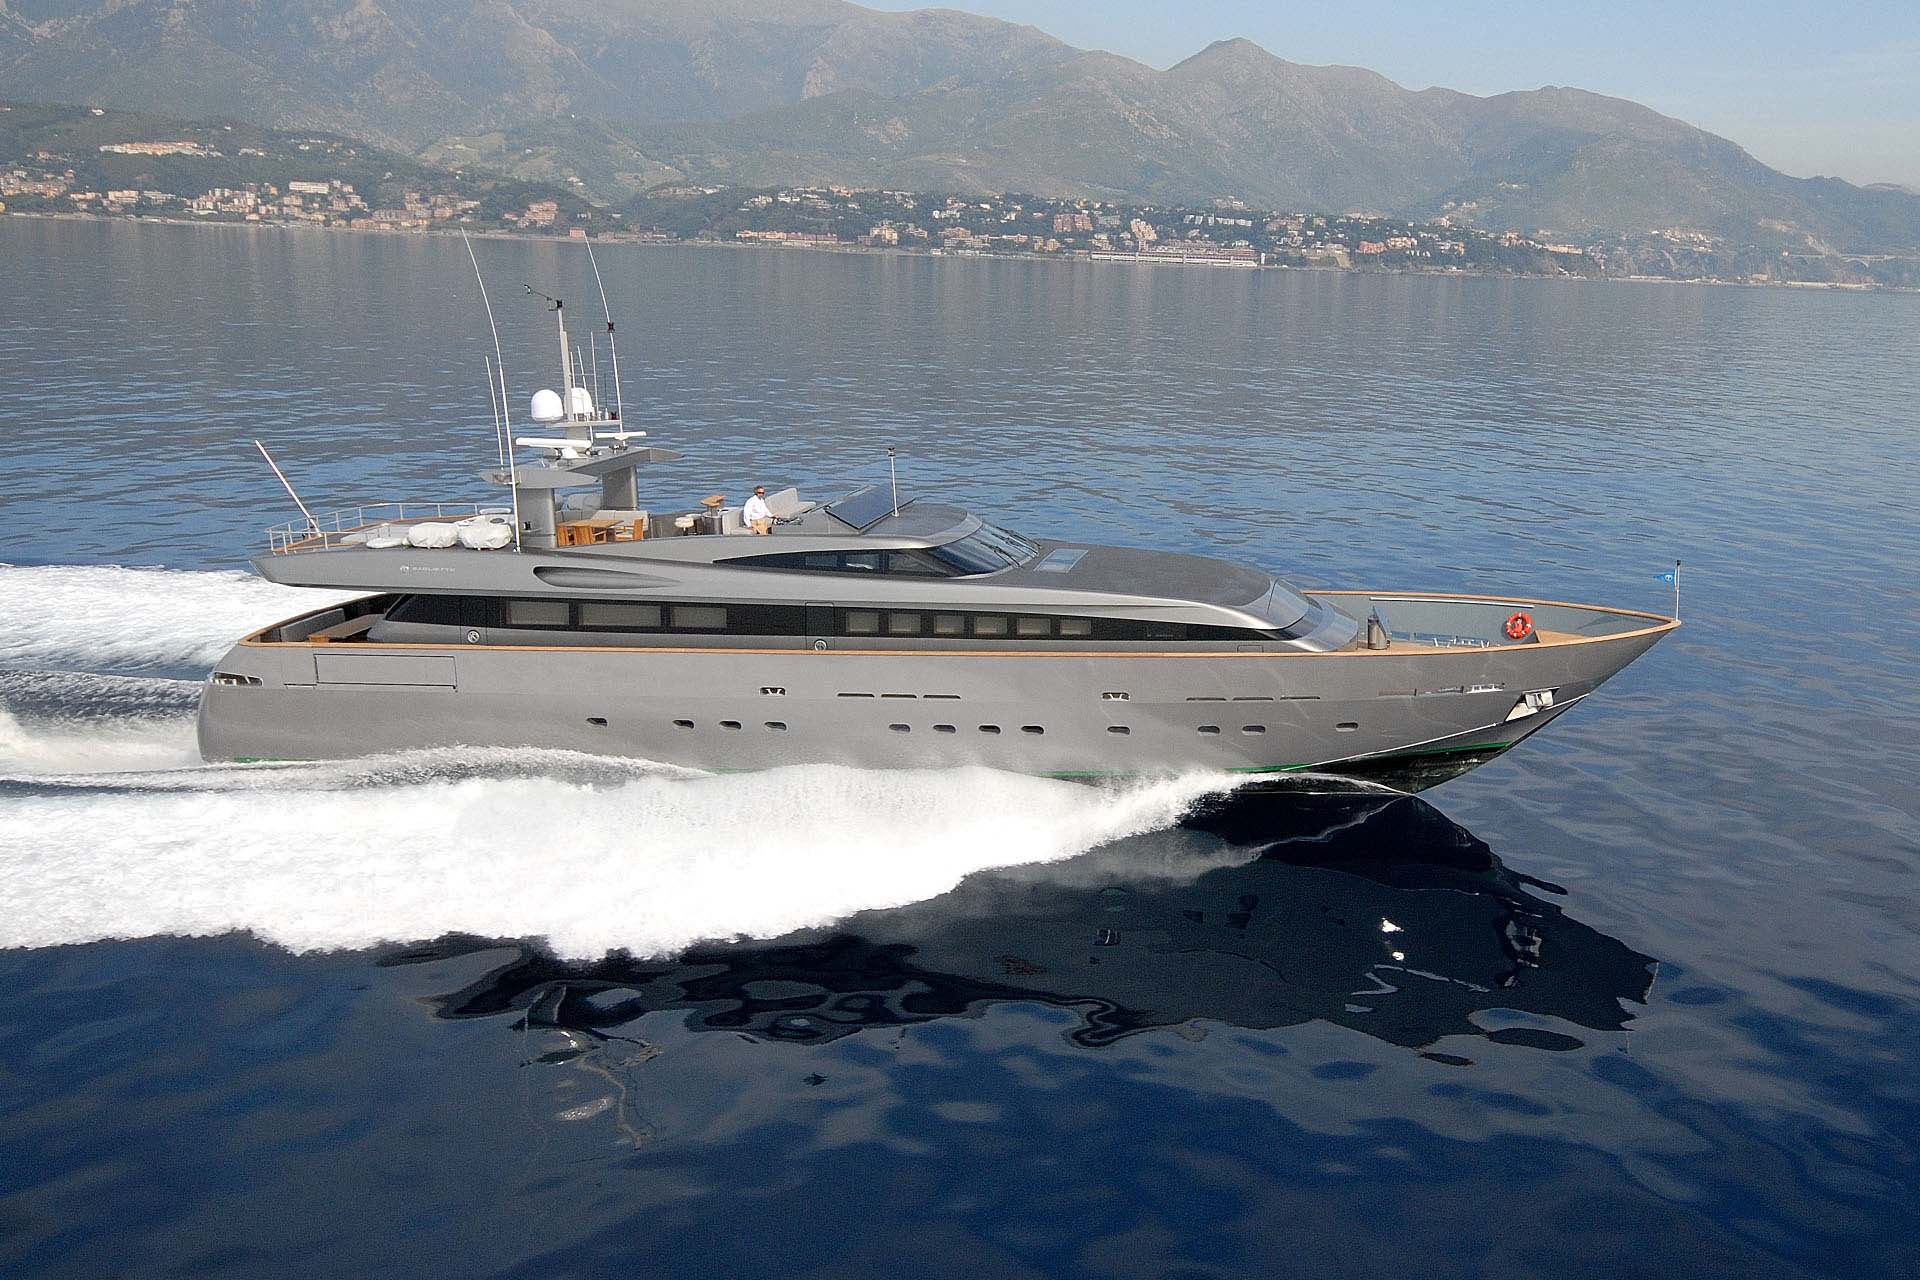 baglietto - B17 - Paskowsky Yacht Design